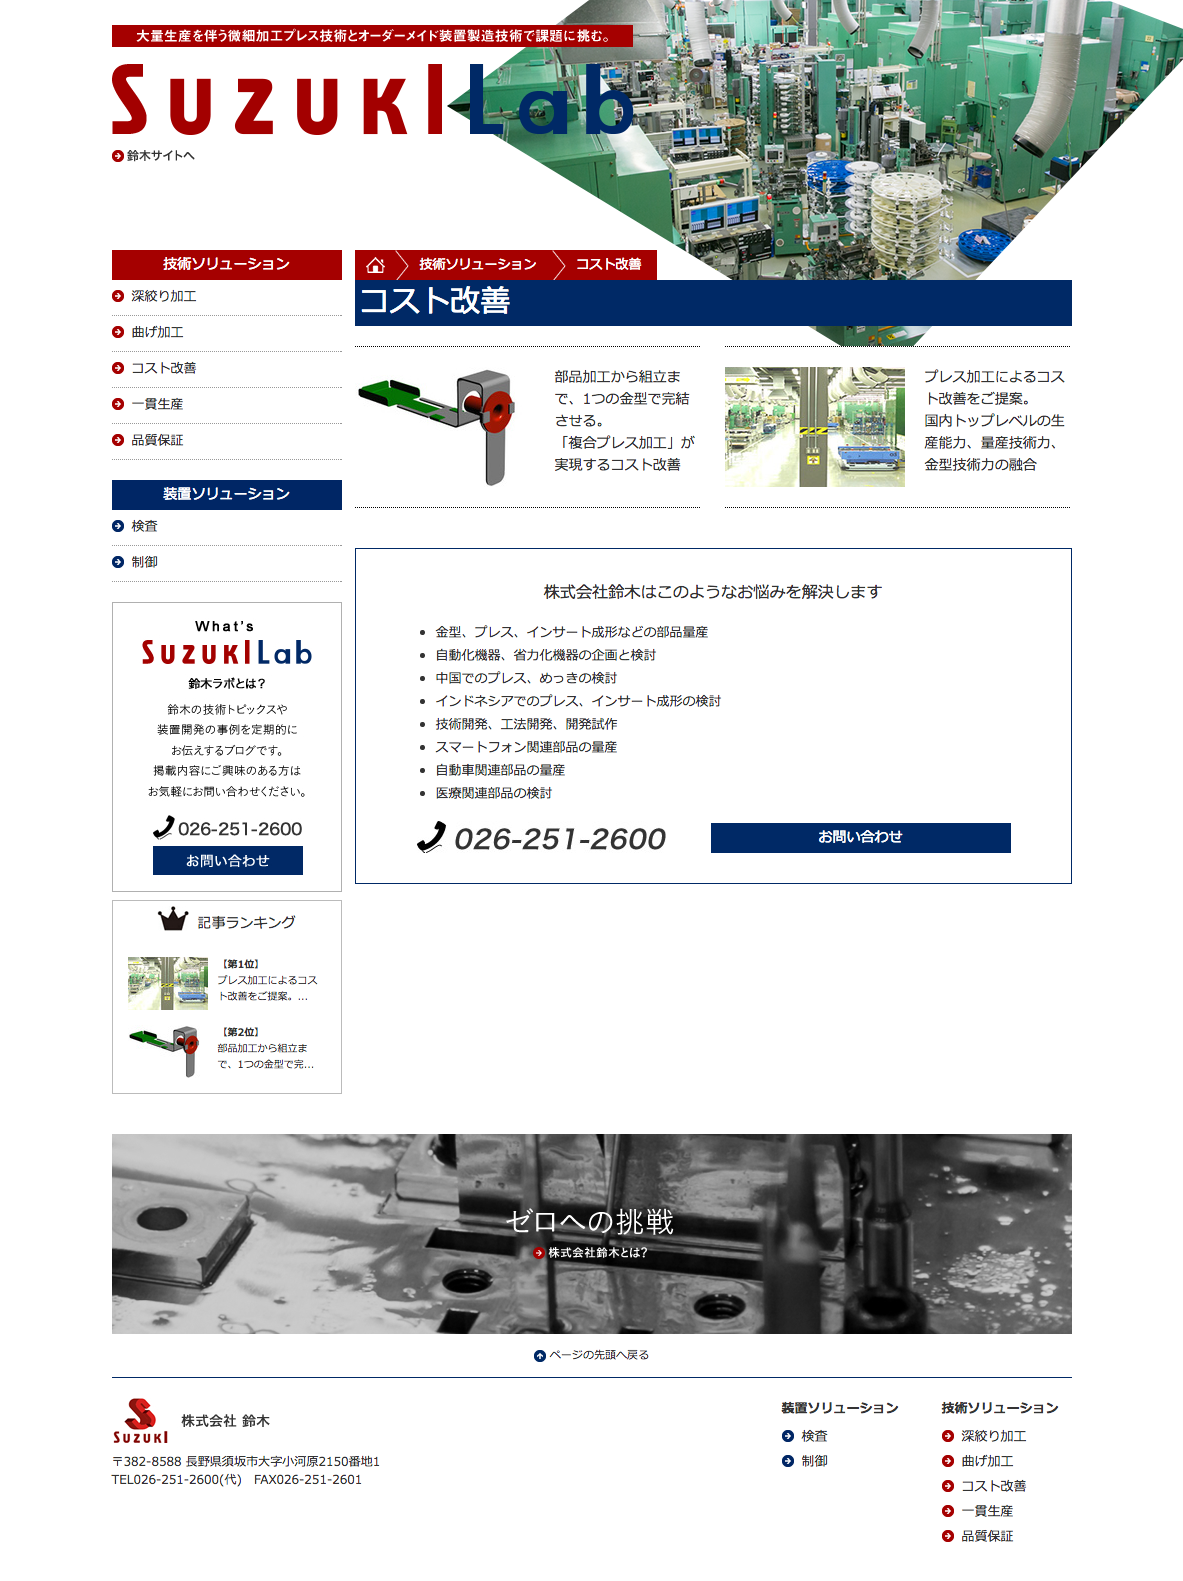 SUZUKI Labは(株)鈴木のユーザー志向型